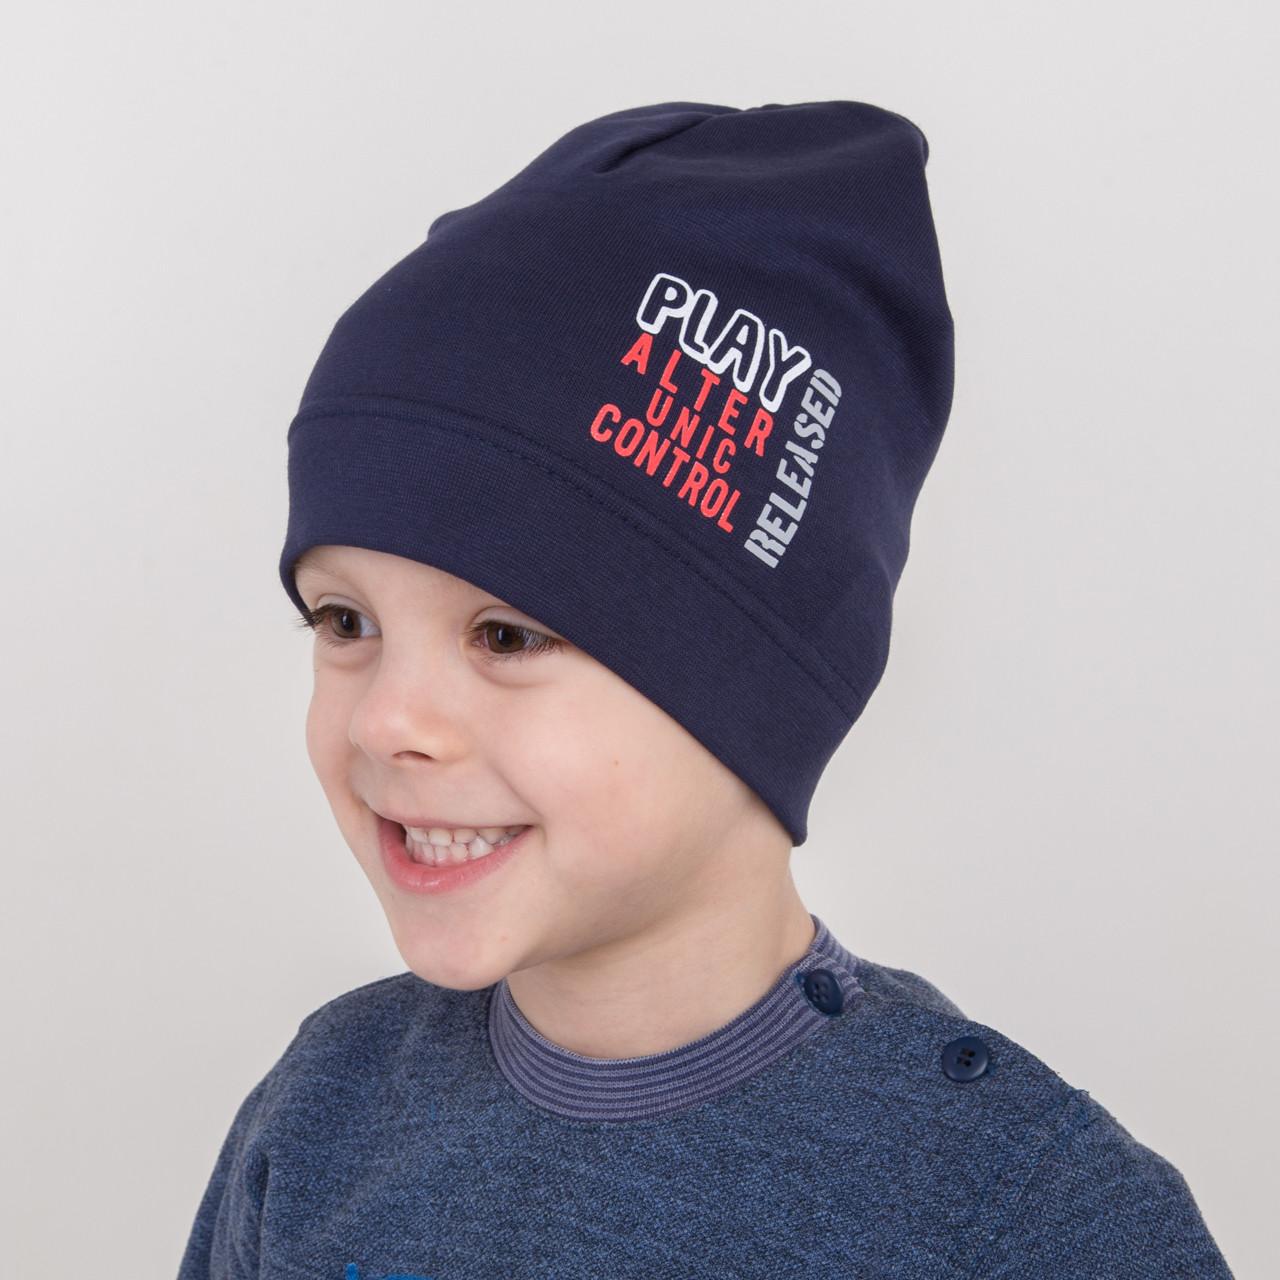 Весенняя шапка на мальчика от производителя оптом 2018 - Play - Артикул 2168